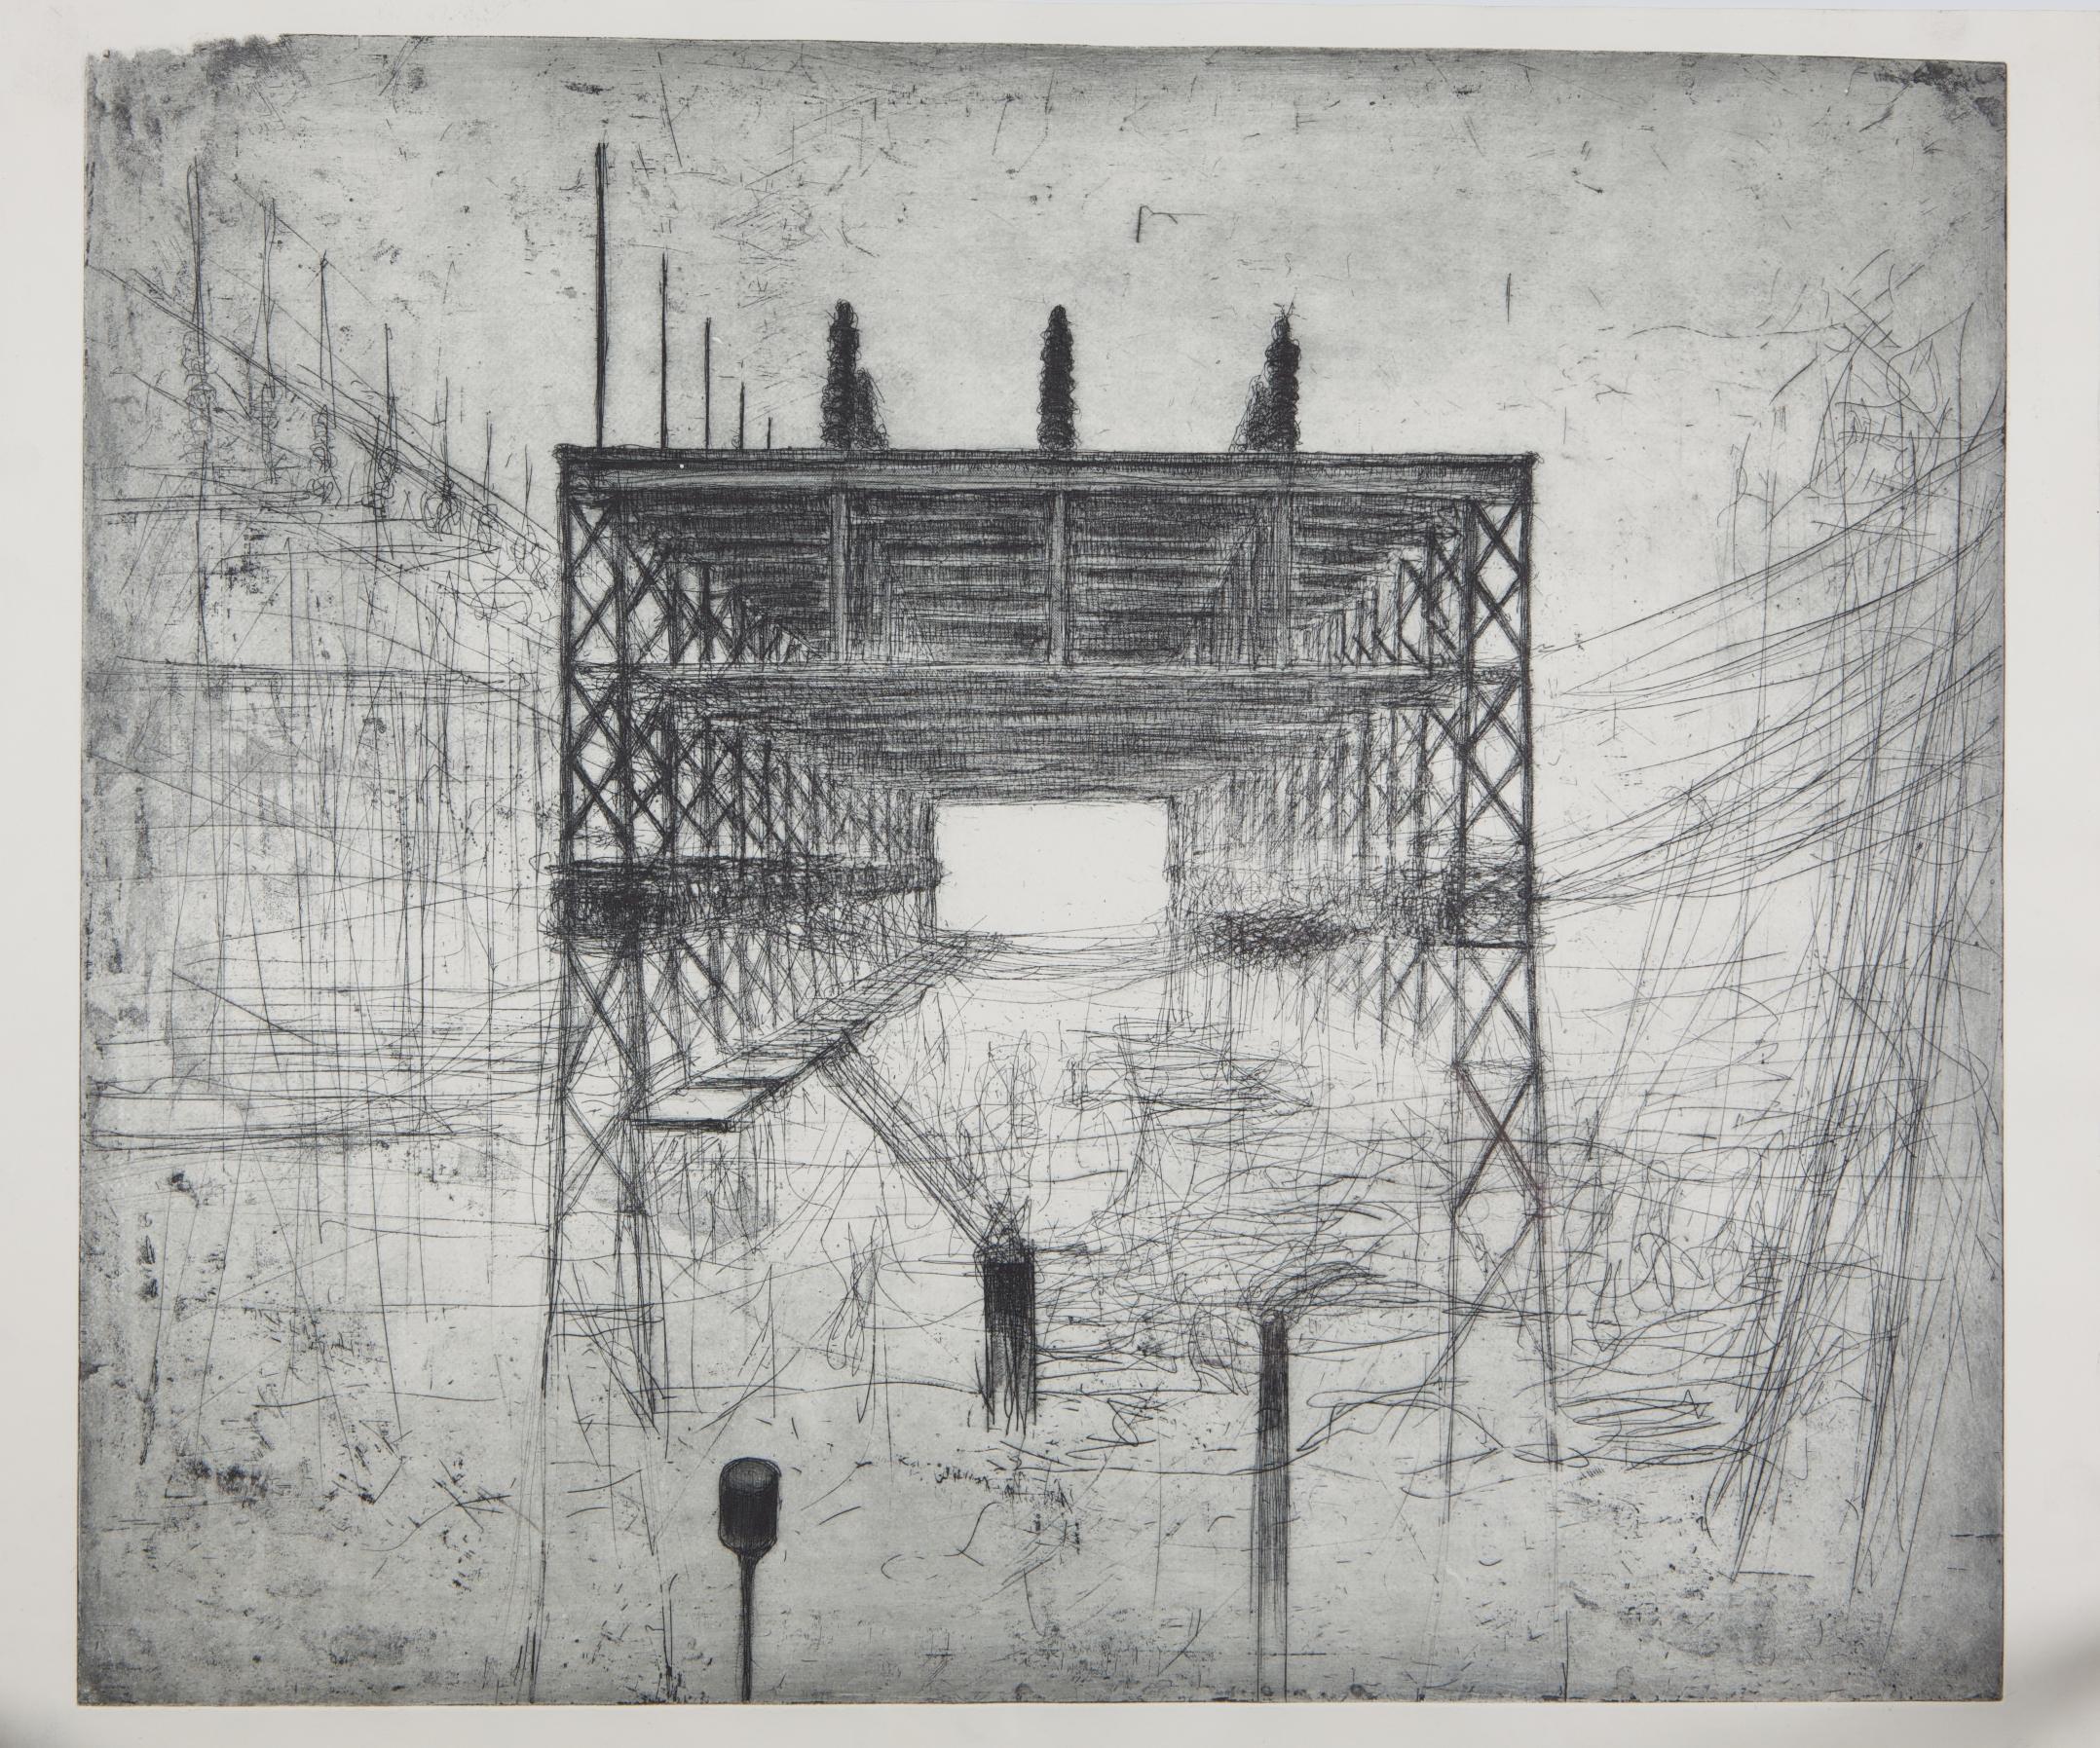 Alta Tensao-Ruinas da Modernidade (High Voltage-Modernity Ruins) by George Gutlich